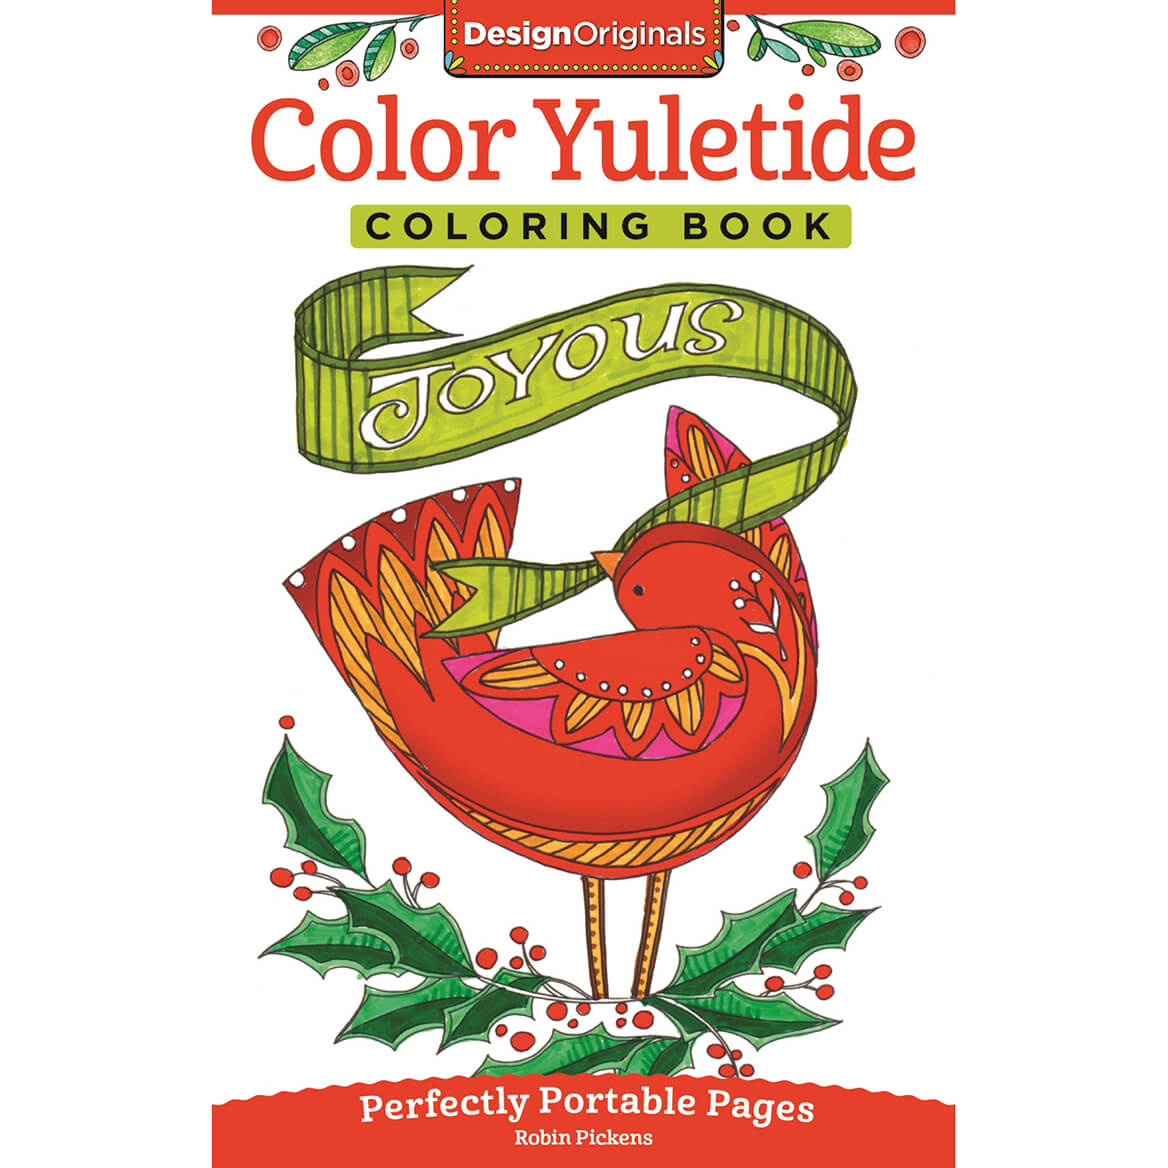 Color Yuletide Coloring Book-370926